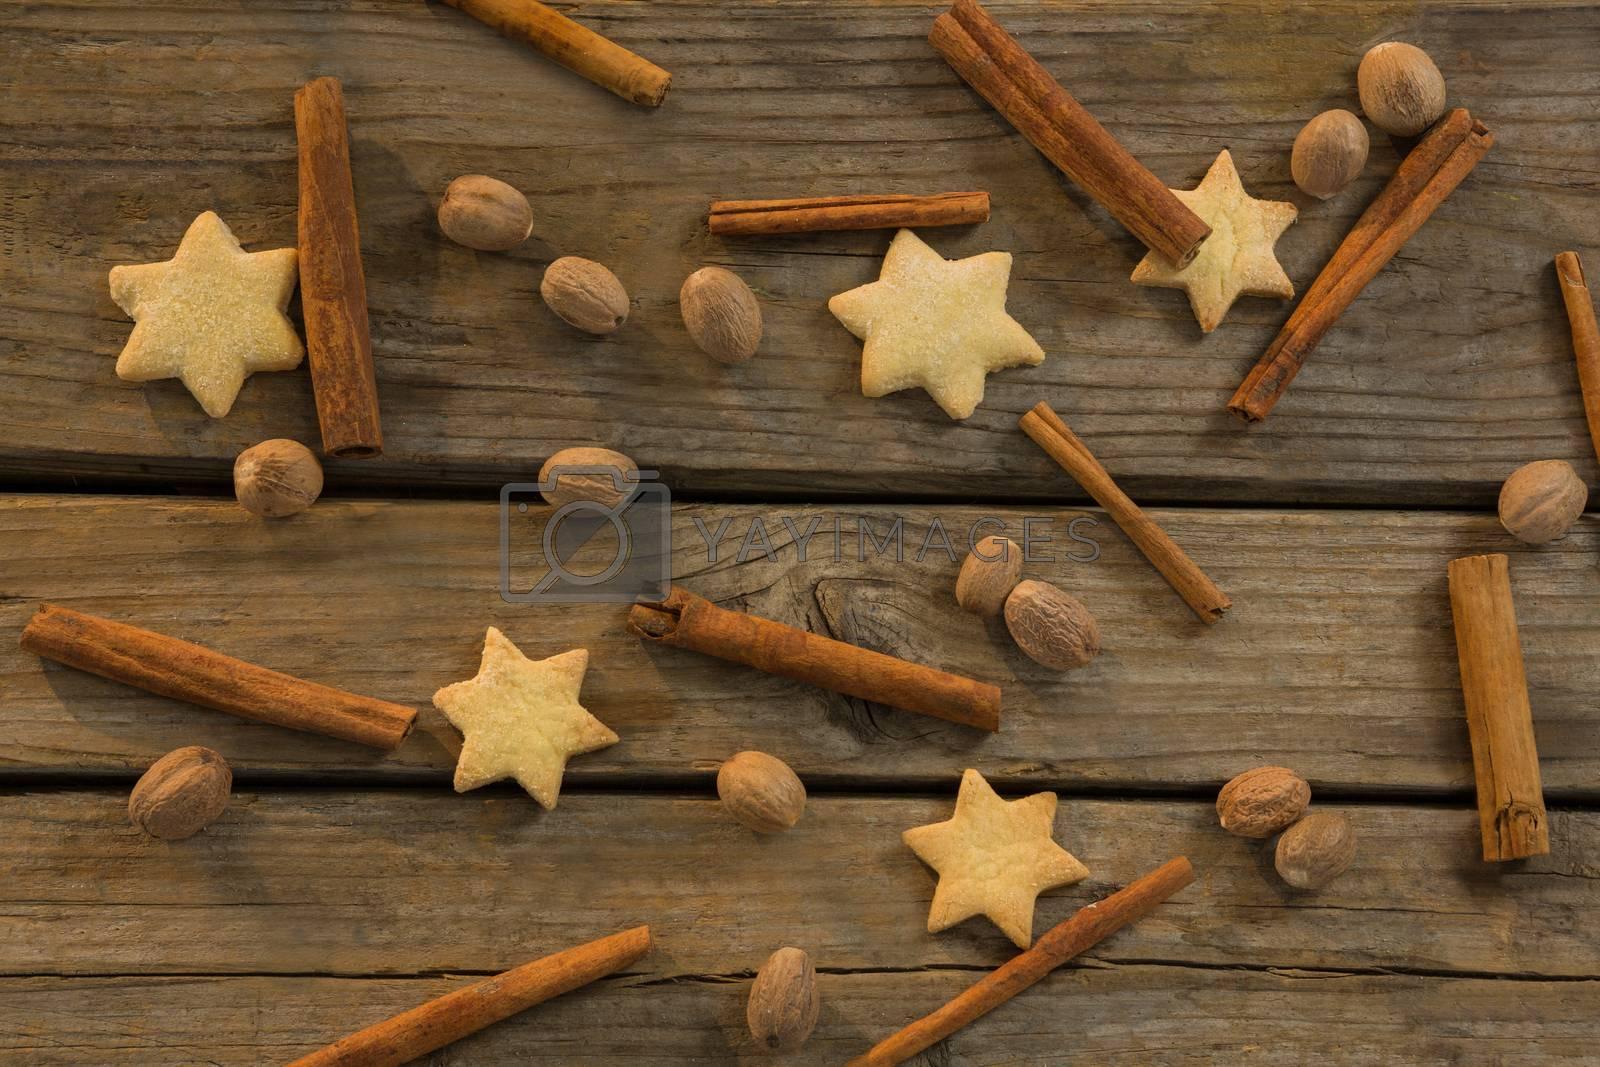 Star shape cookies and cinnamon sticks with walnuts by Wavebreakmedia